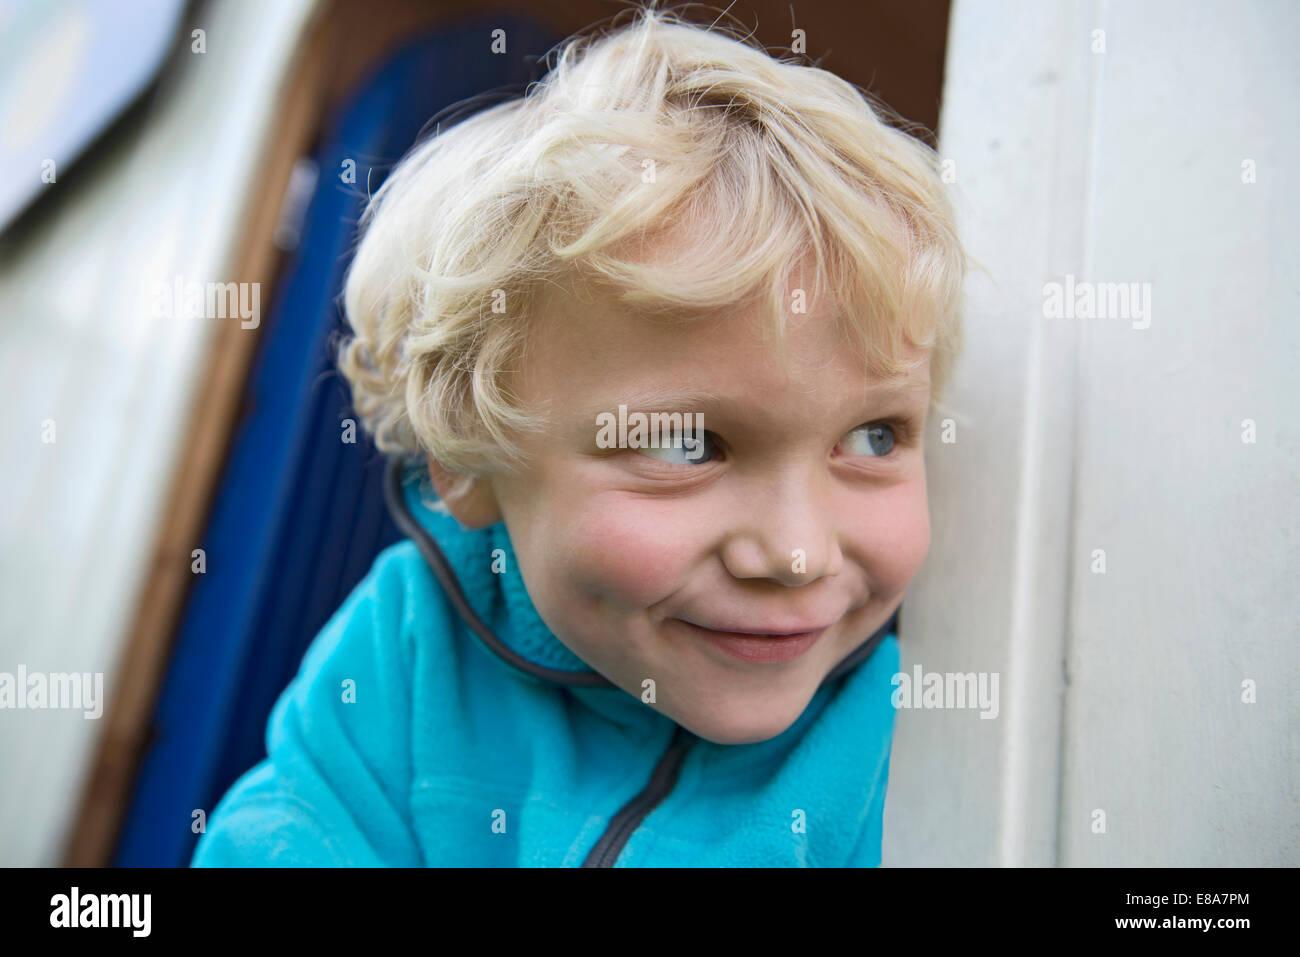 Porträt der freche blonde junge hautnah Stockbild